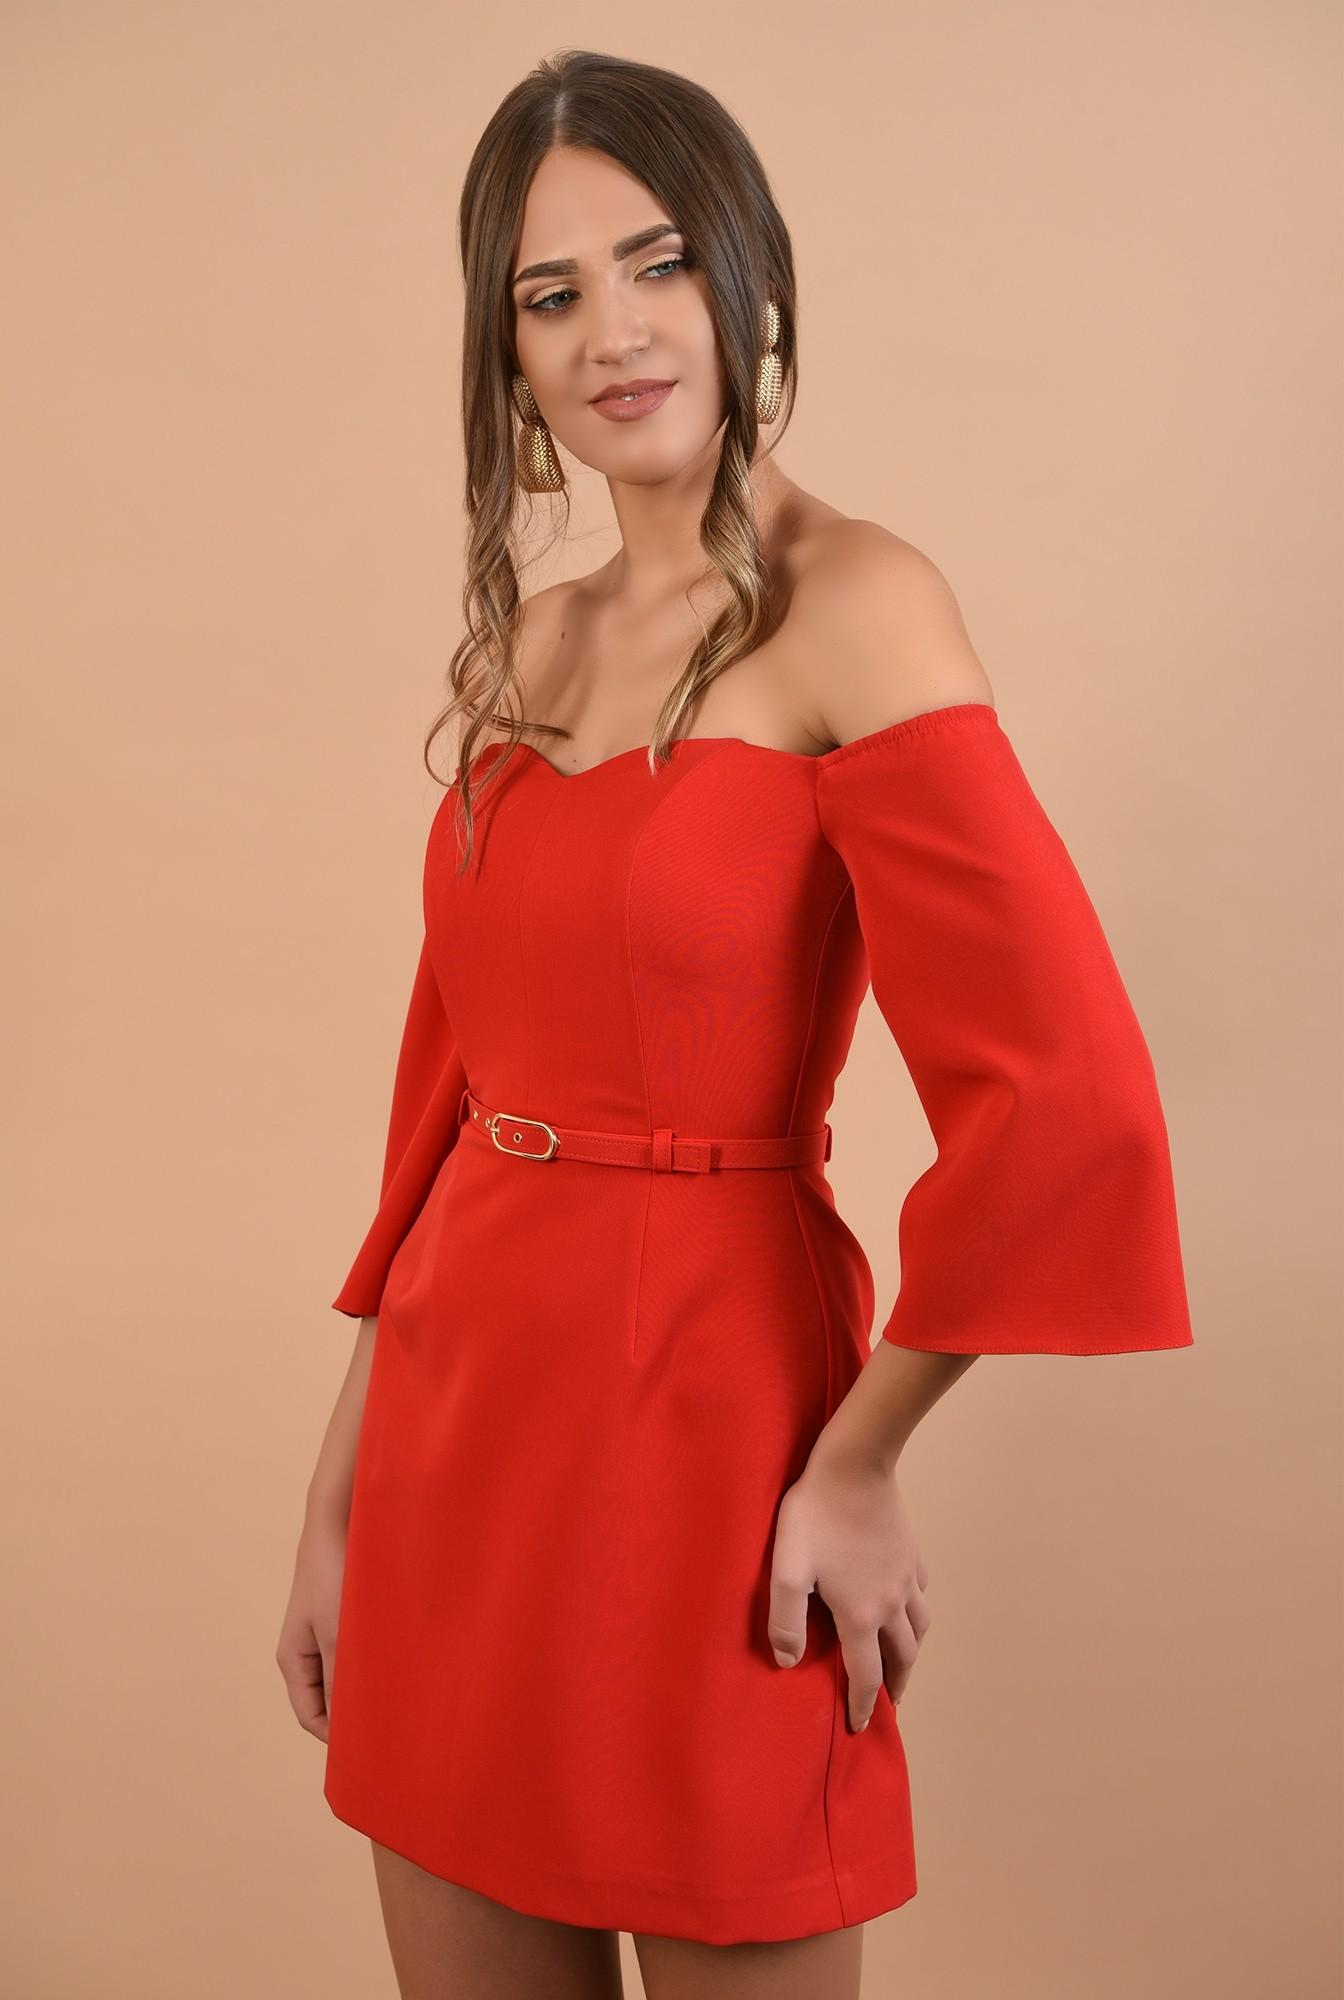 2 - rochie eleganta, mini, rosie, umeri dezgoliti, decolteu inima, Poema